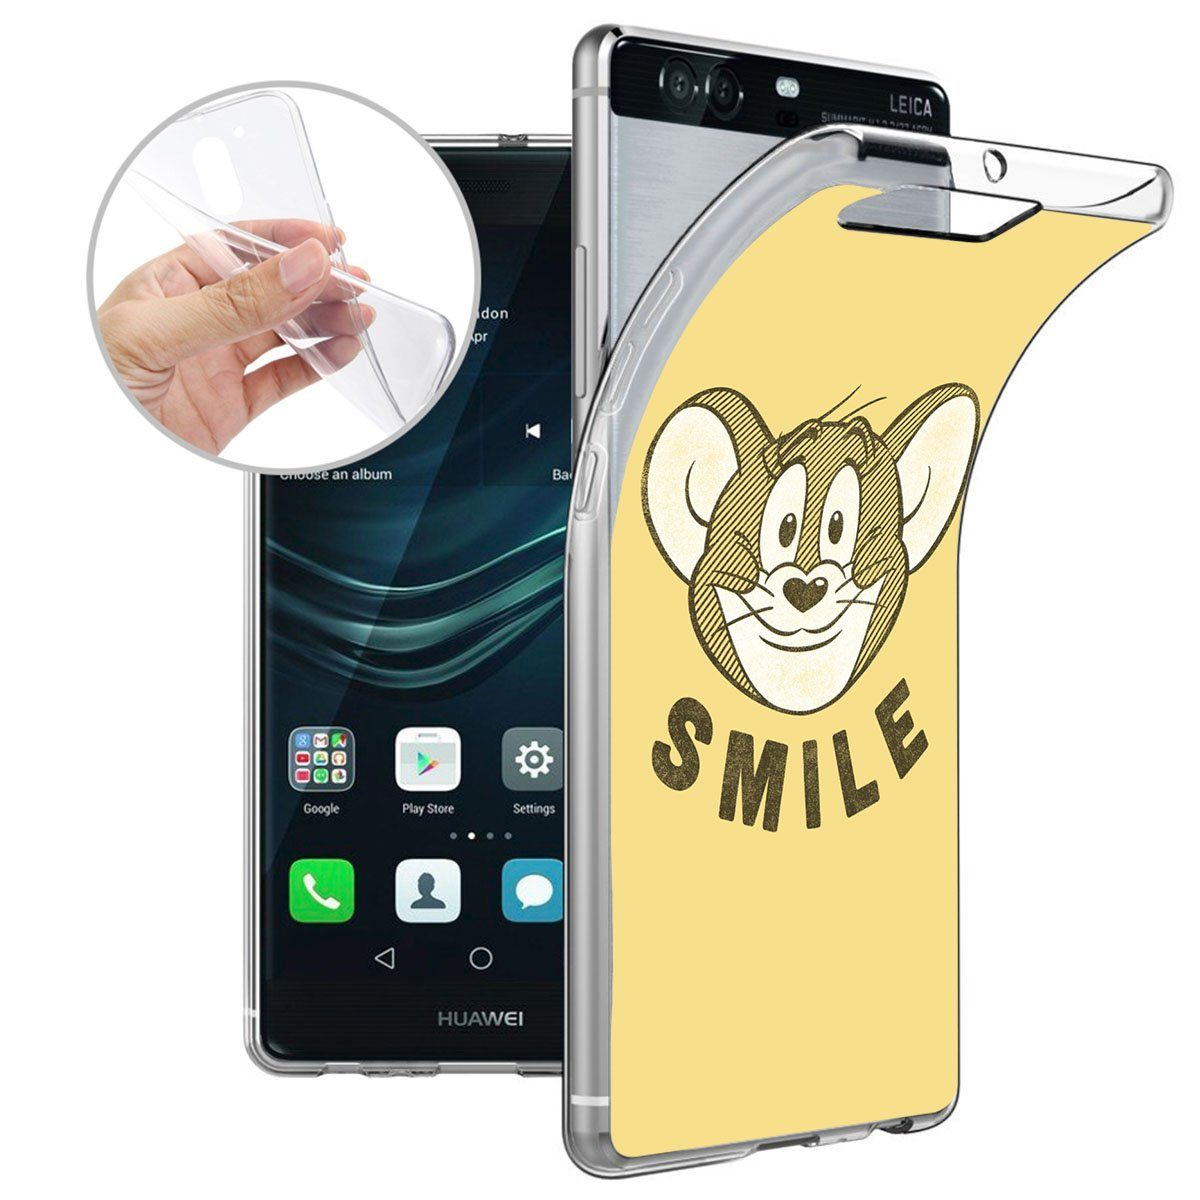 Finoo Smartphone-Hülle Huawei P9